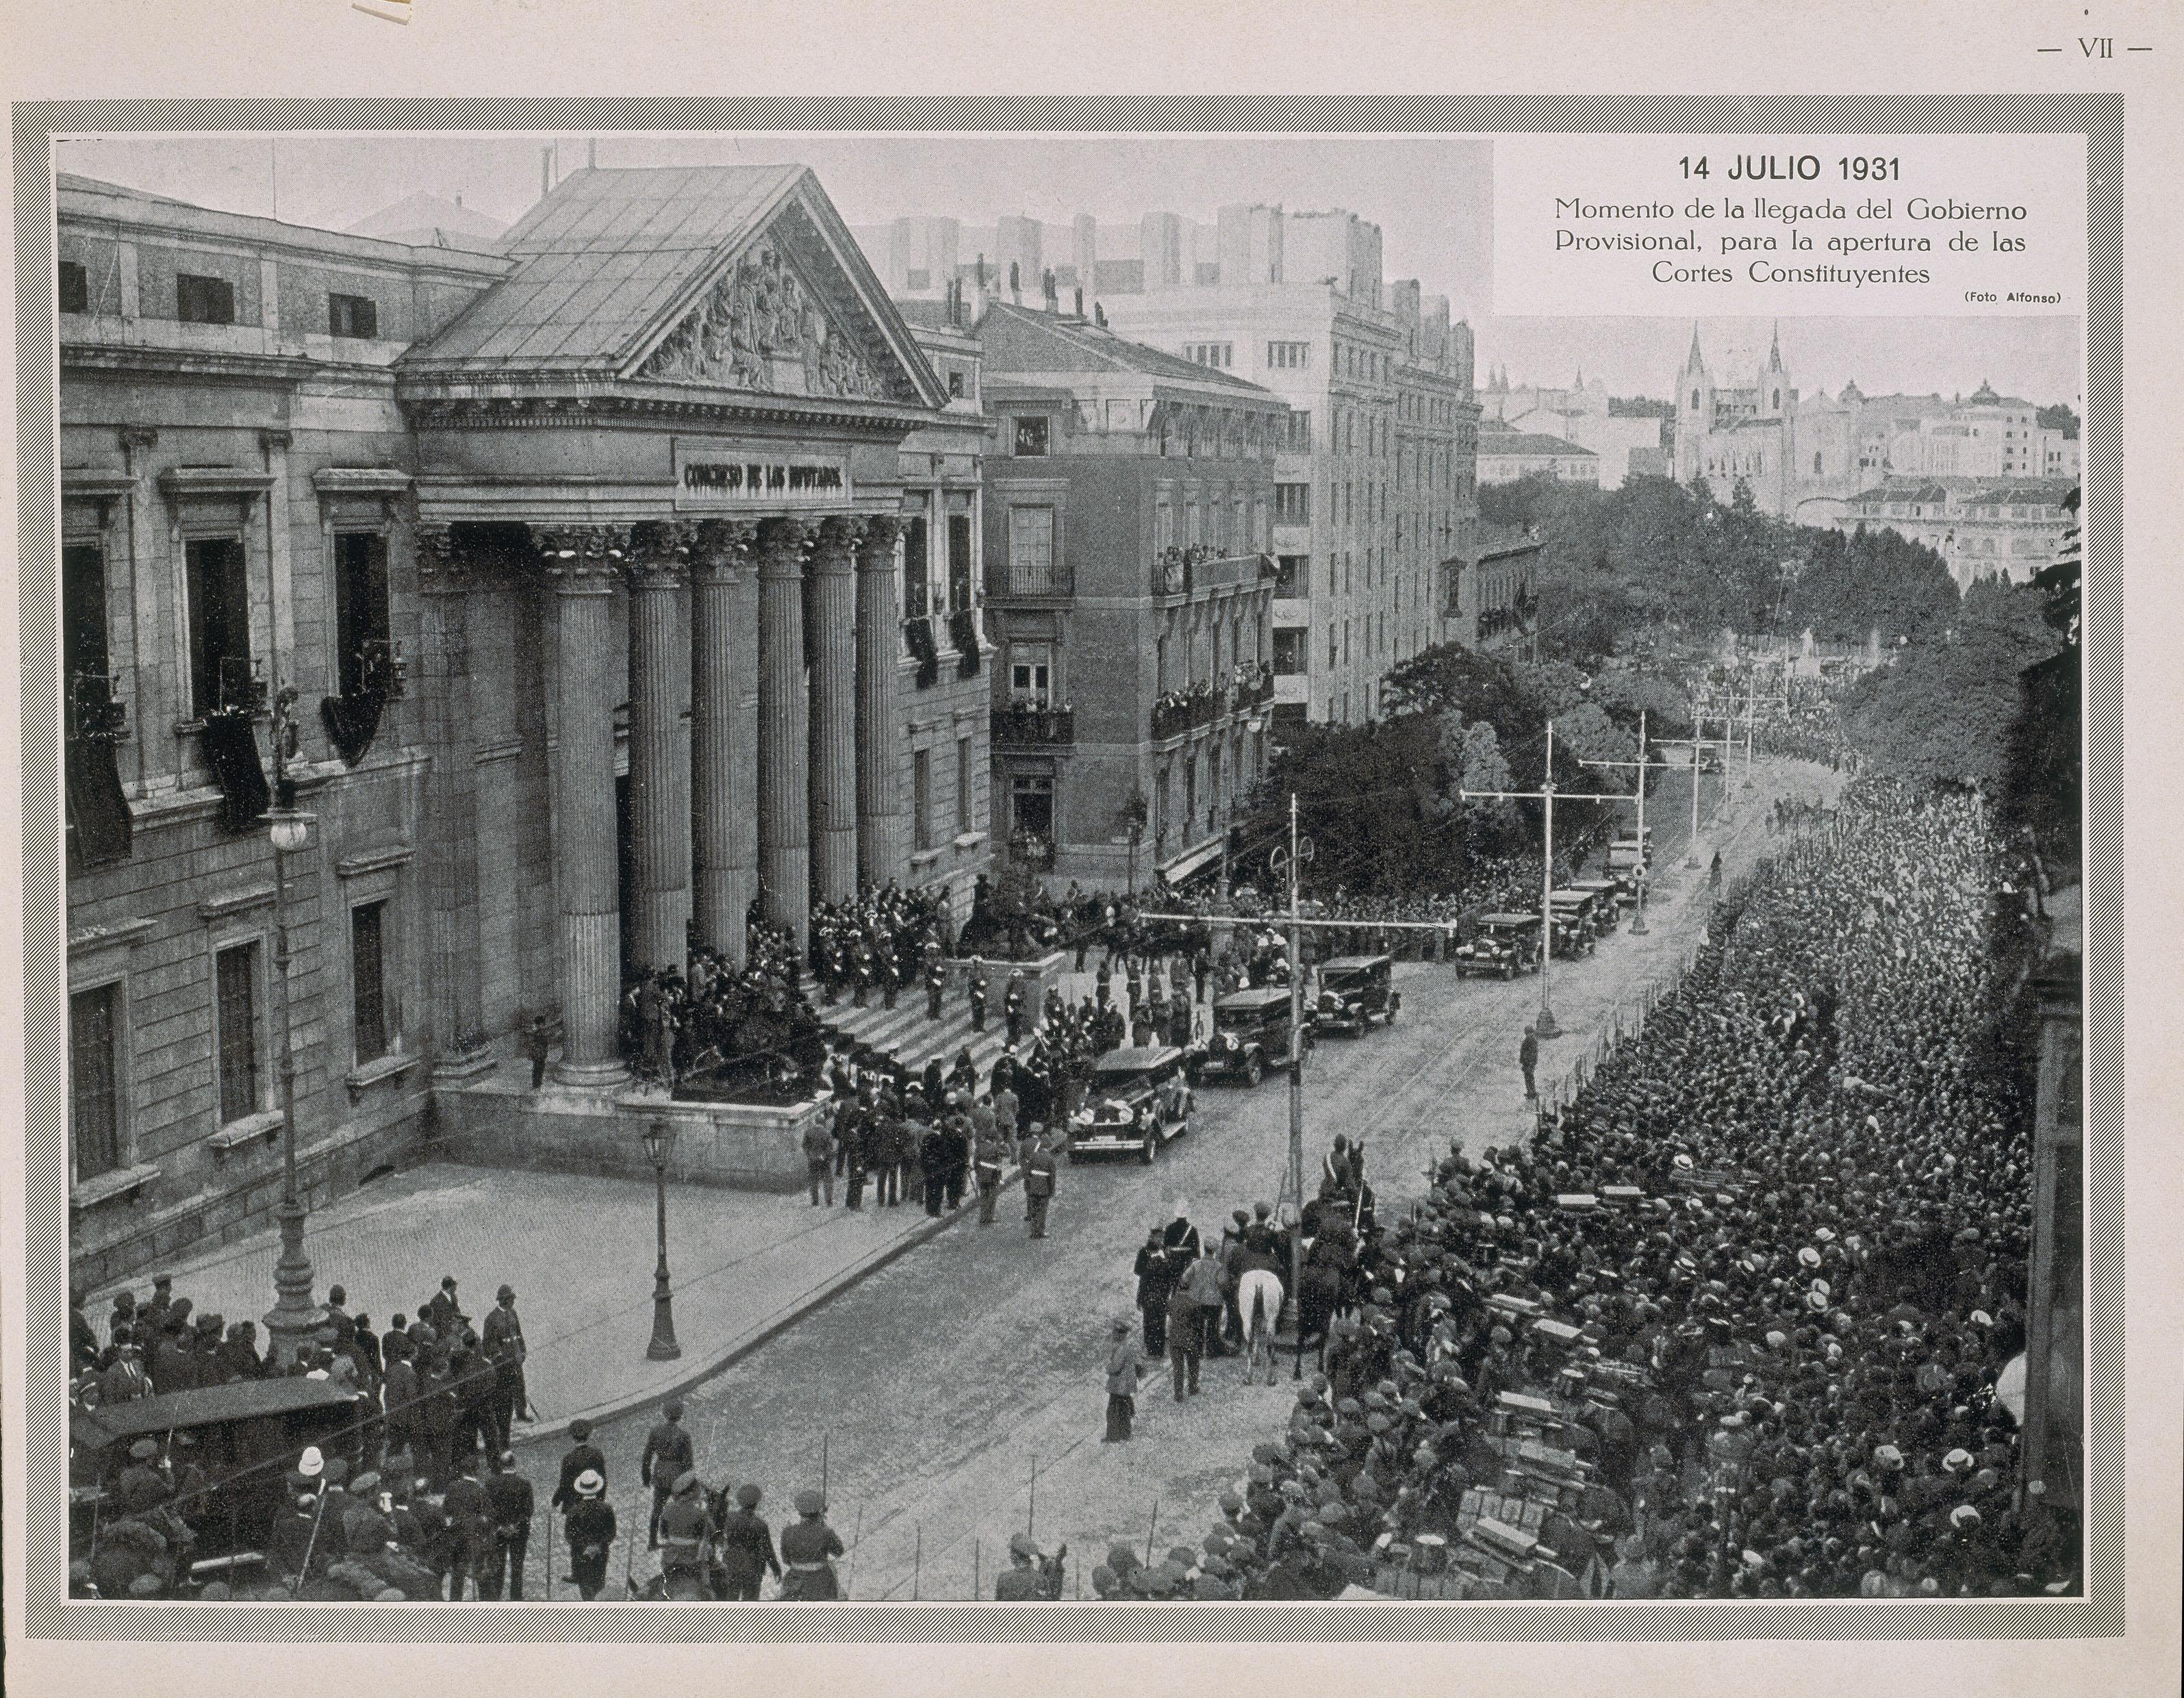 1931 republica